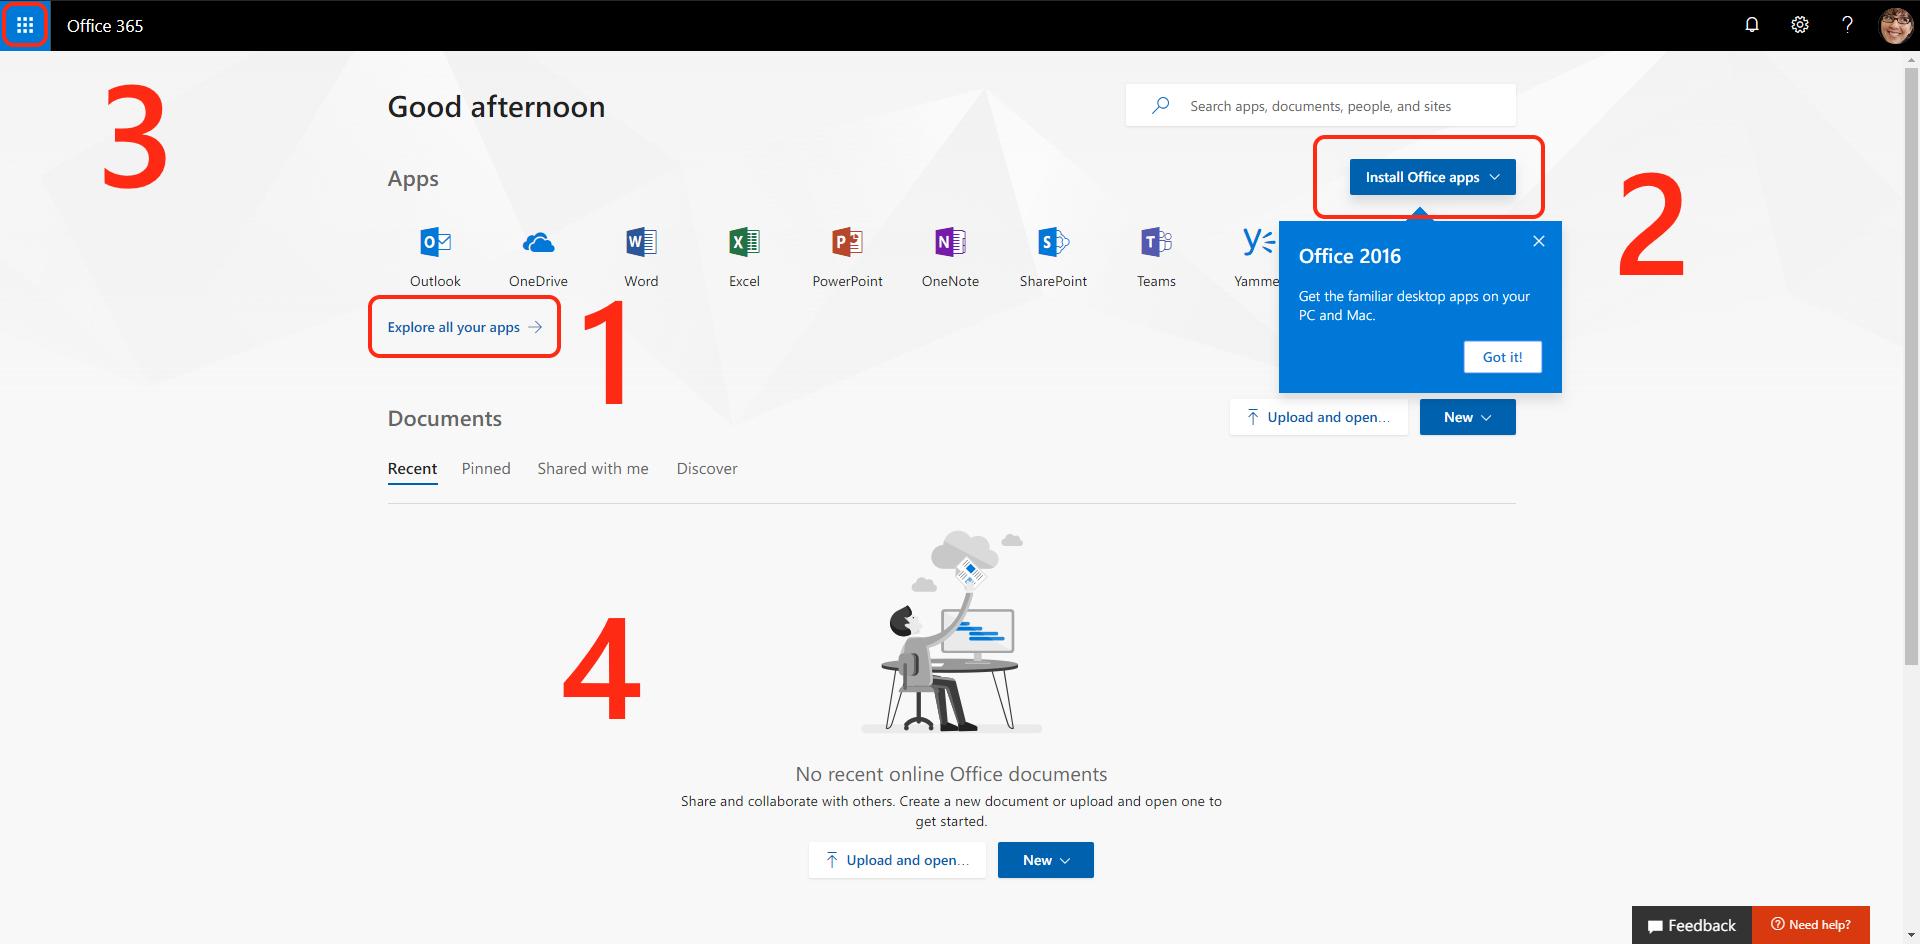 Portal Office 365